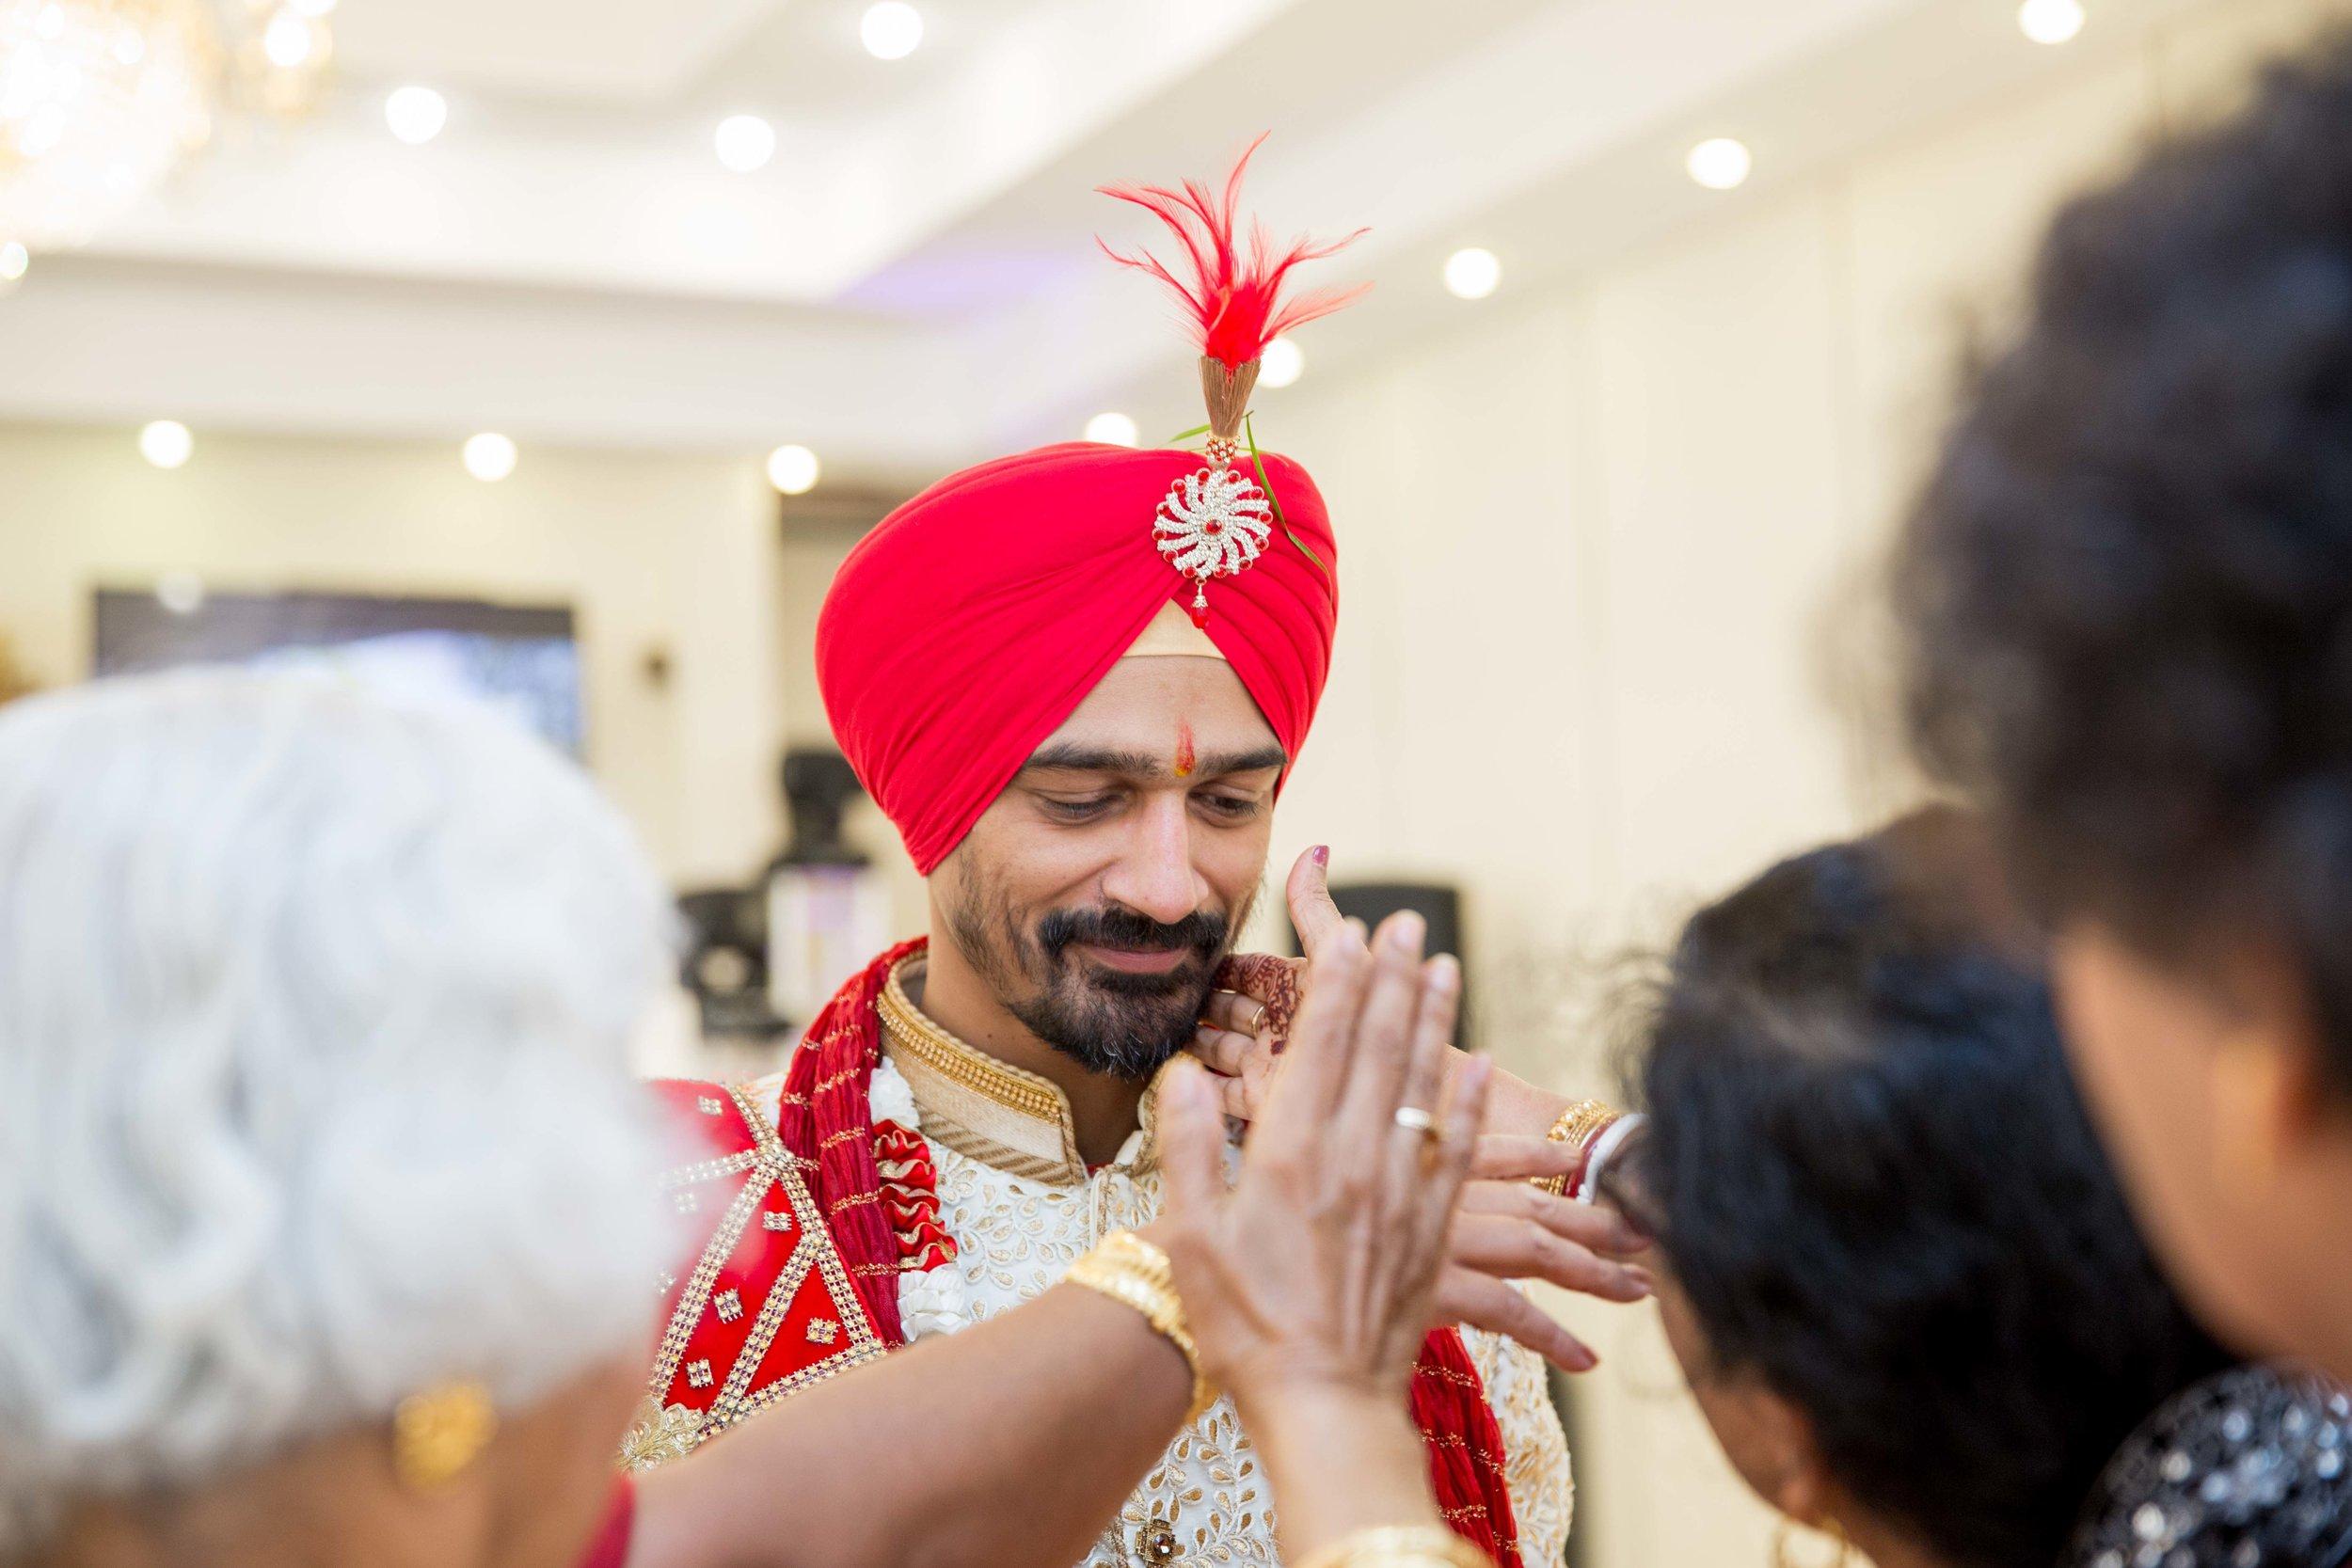 ramada-park-hall-hotel-birmingham-wolverhampton-hindu-wedding-asian-wedding-photography-natalia-smith-photography-18.jpg